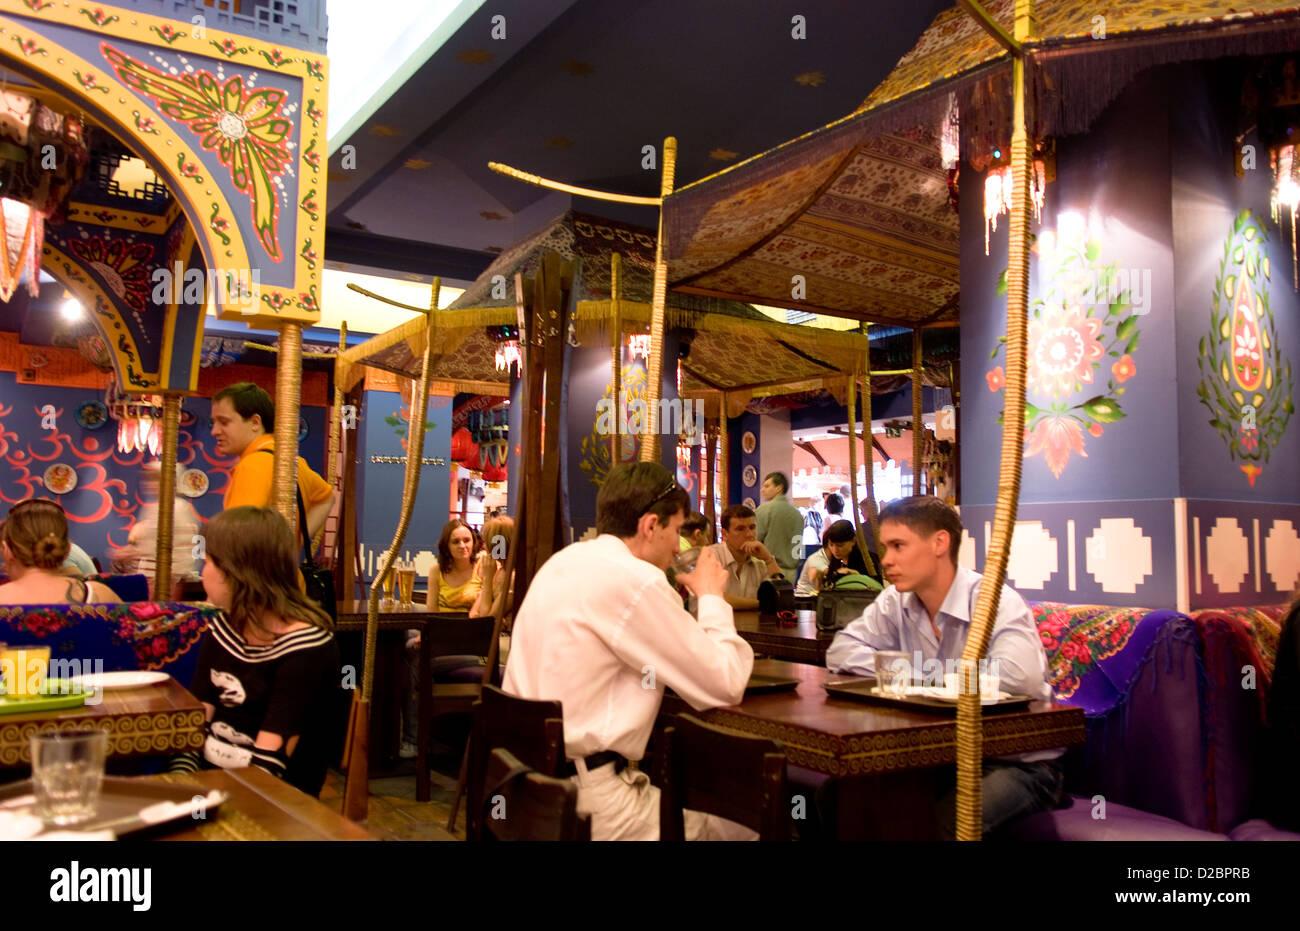 Inside Ukrainian Restaurant In Kiev, Ukraine. - Stock Image